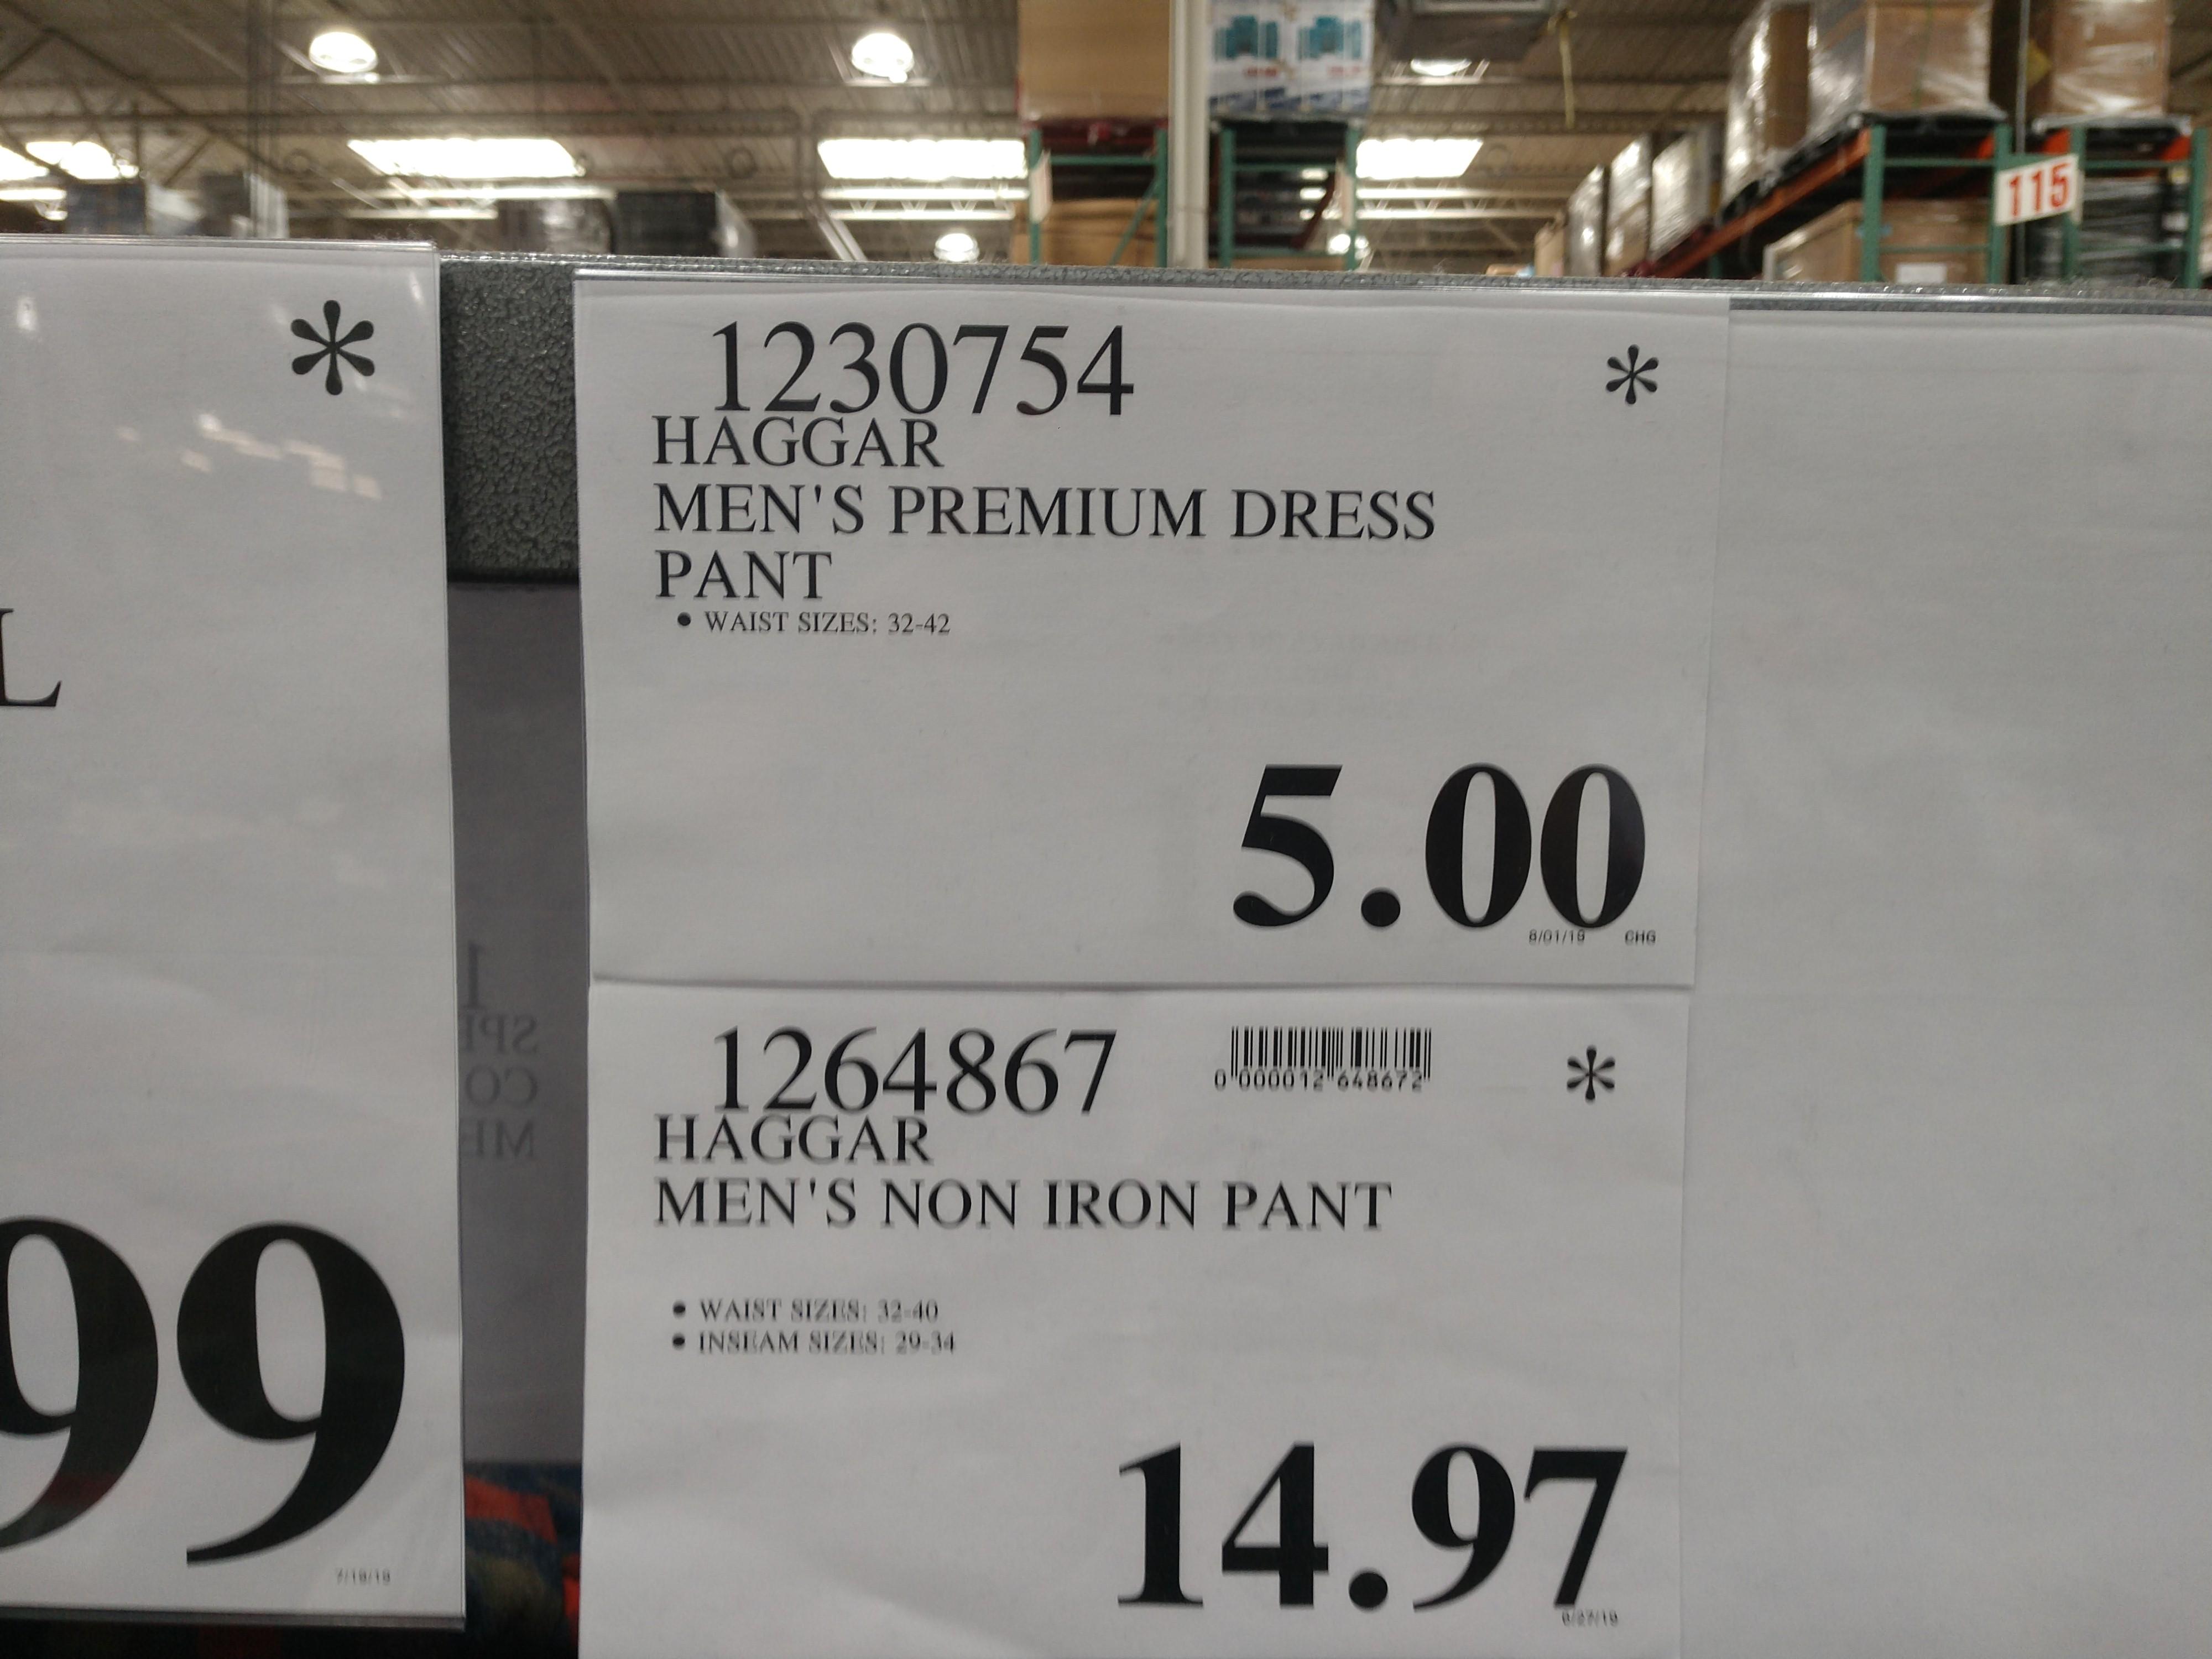 Haggar Premium Stretch Dress Pant - YMMV $5